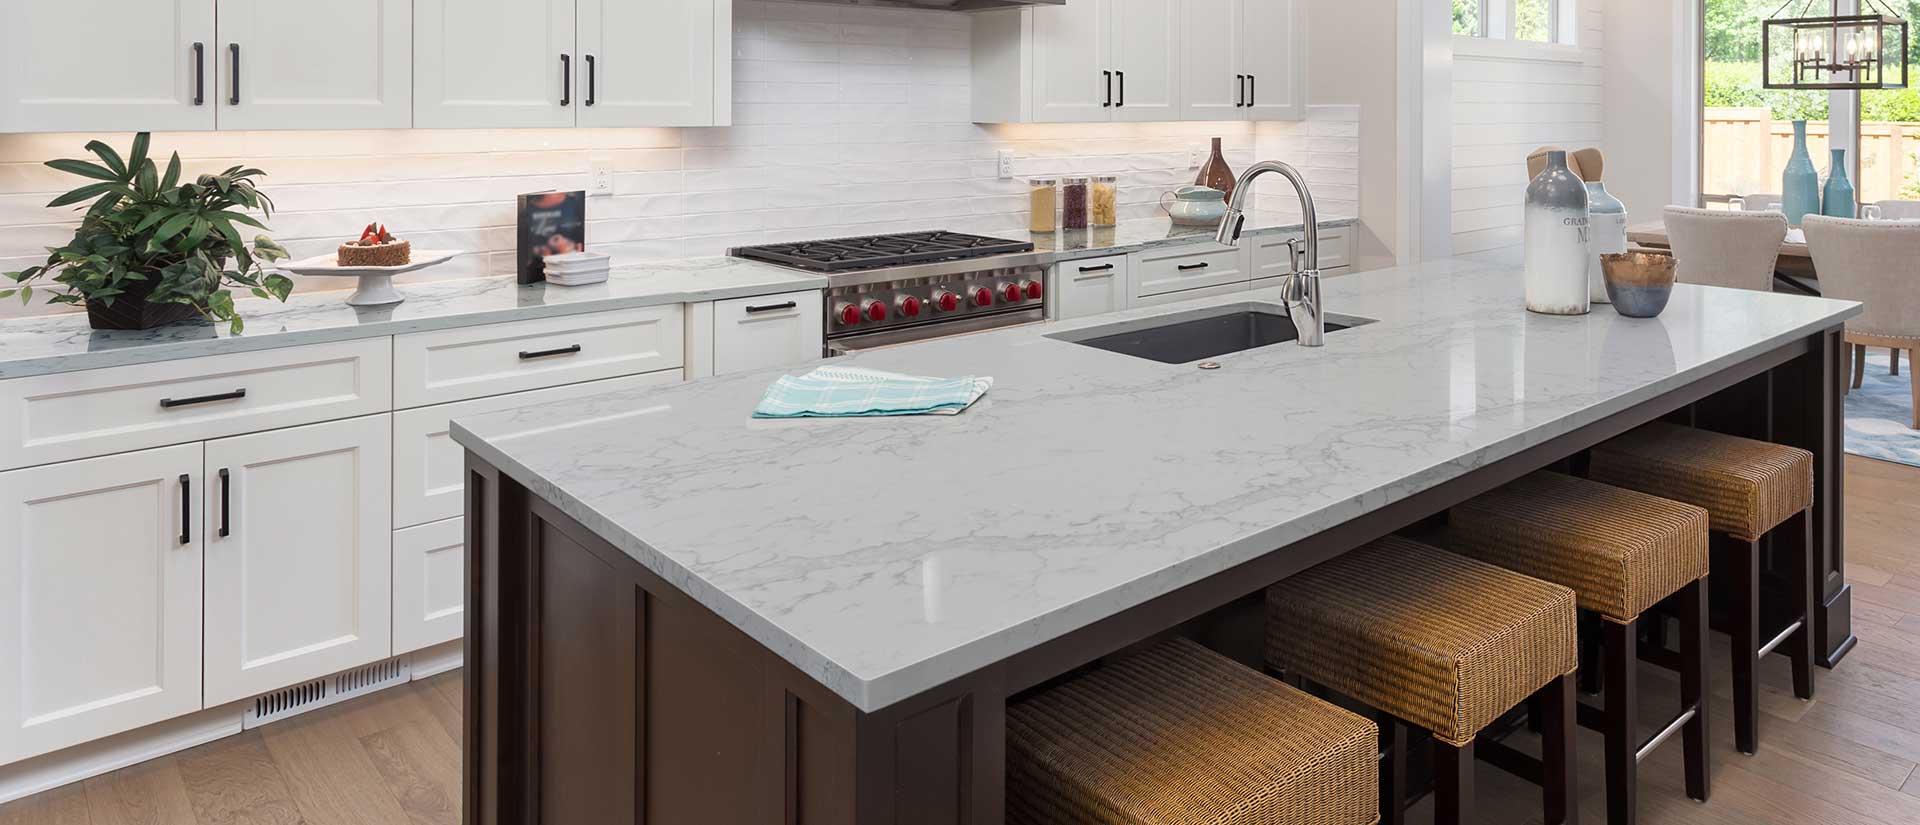 Msi Quartz Calacatta Naples Royal Kitchen And Flooring